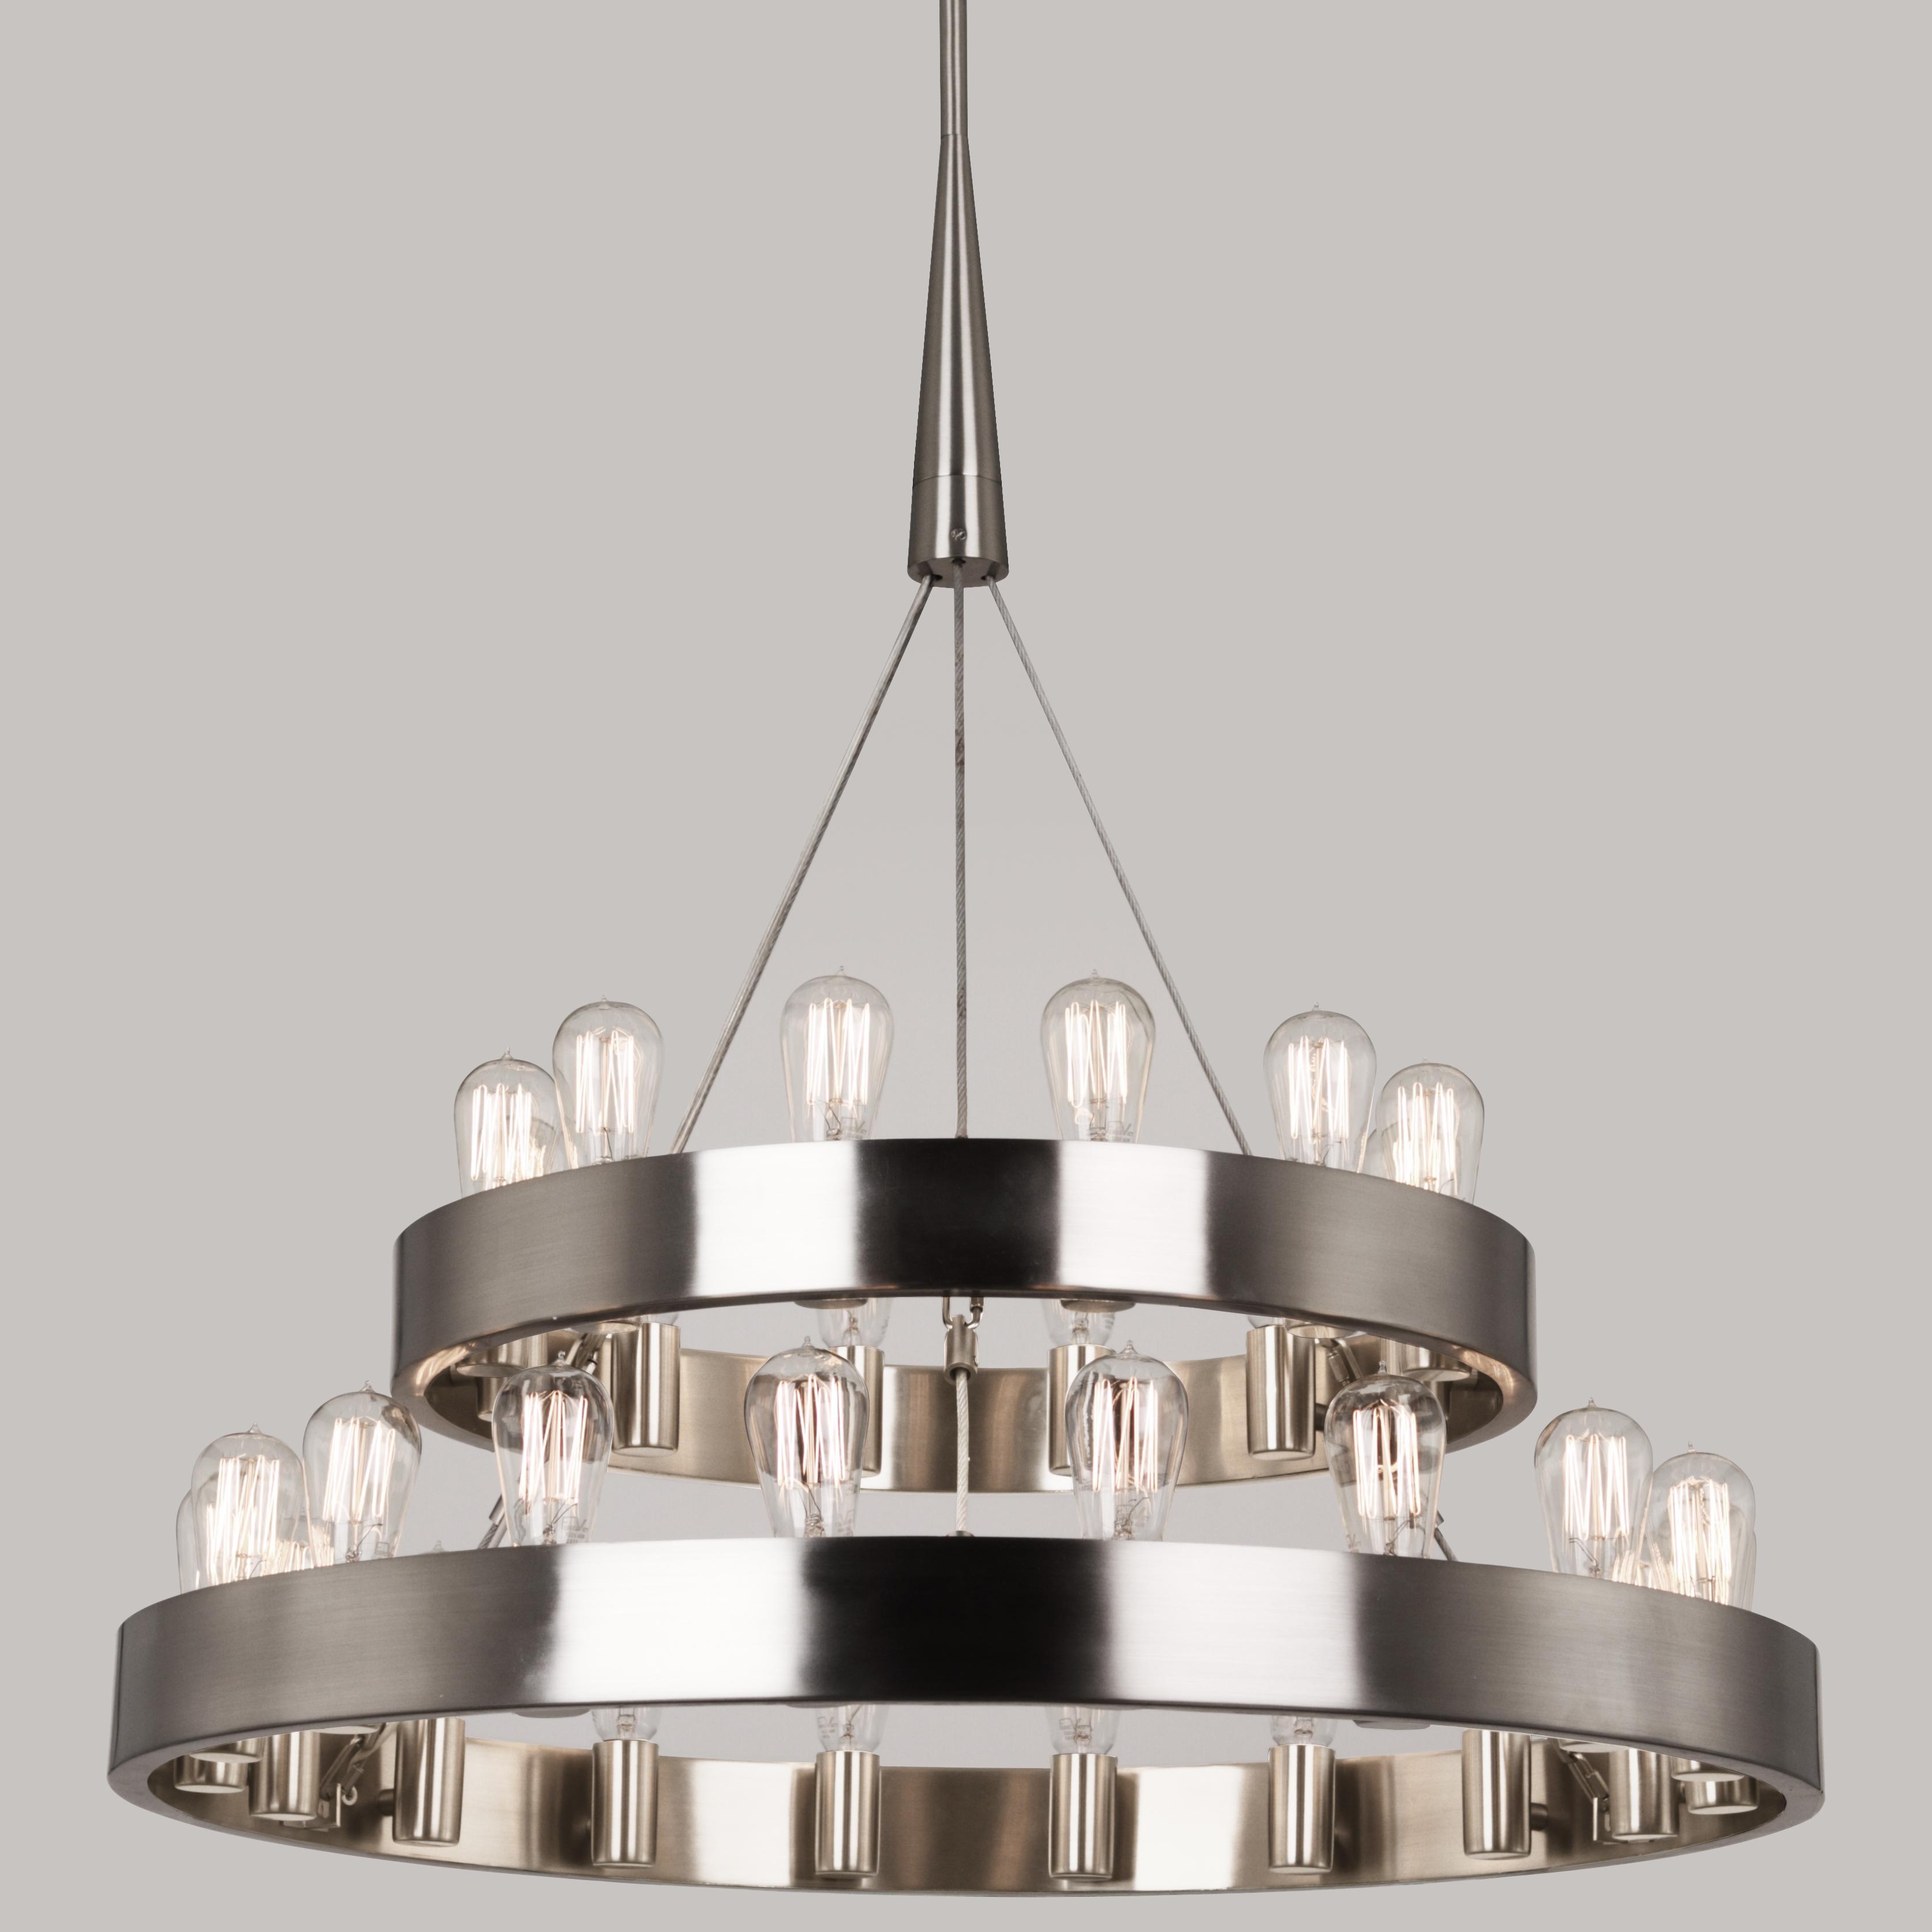 Dining Room Lighting Candelaria 2 Tier Chandelier By Robert AbbeyCandelaria Abbey